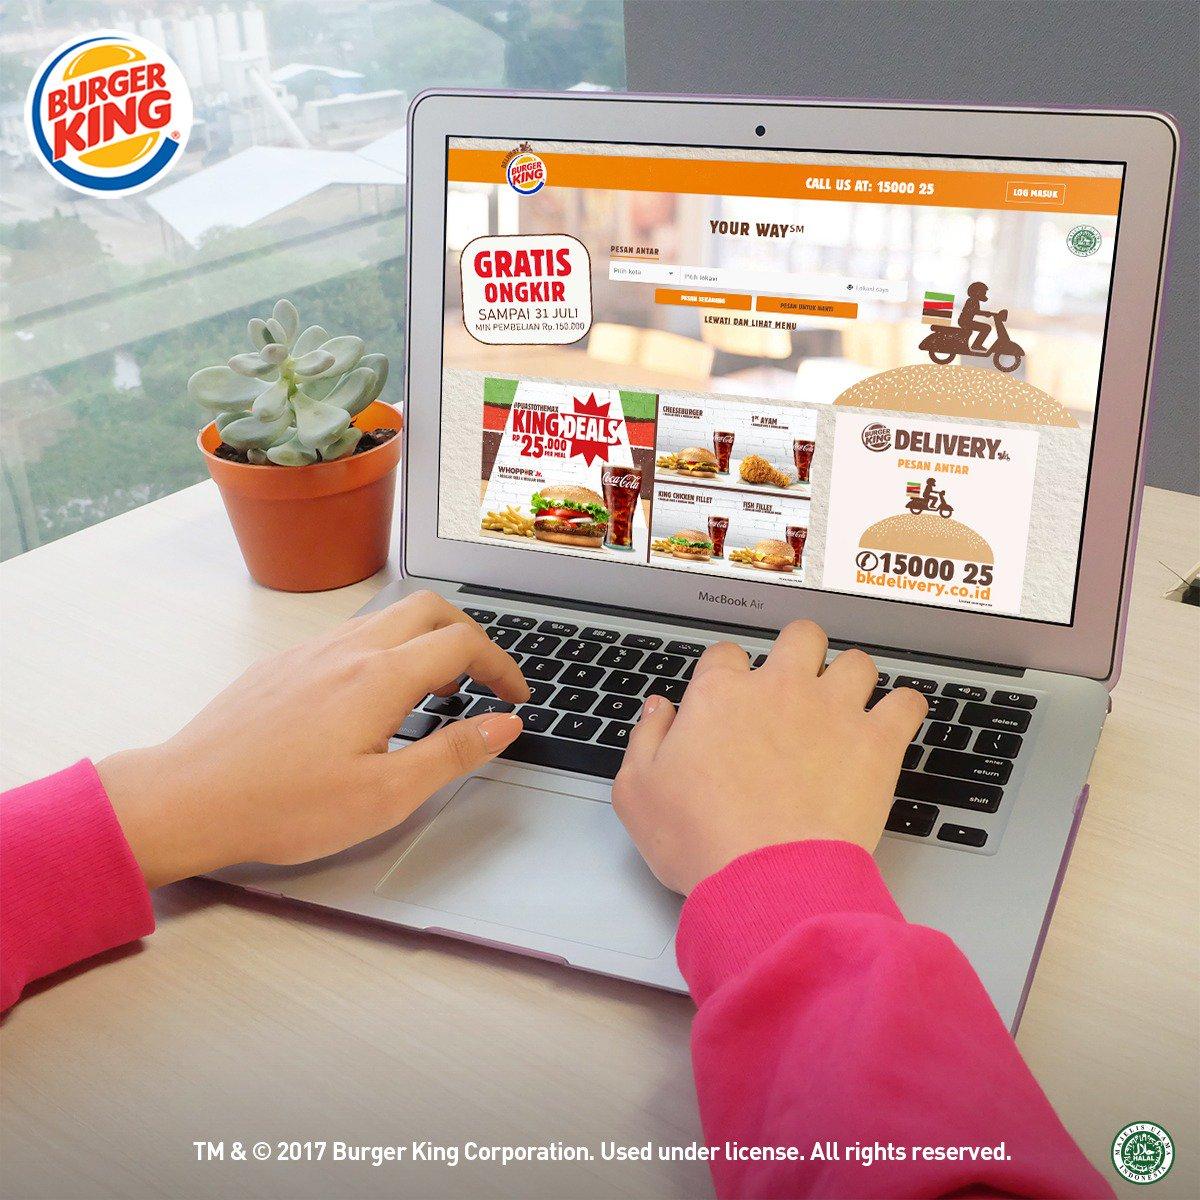 BurgerKing - Voucher Delivery Gratis Ongkir & Gratis 2 Ayam